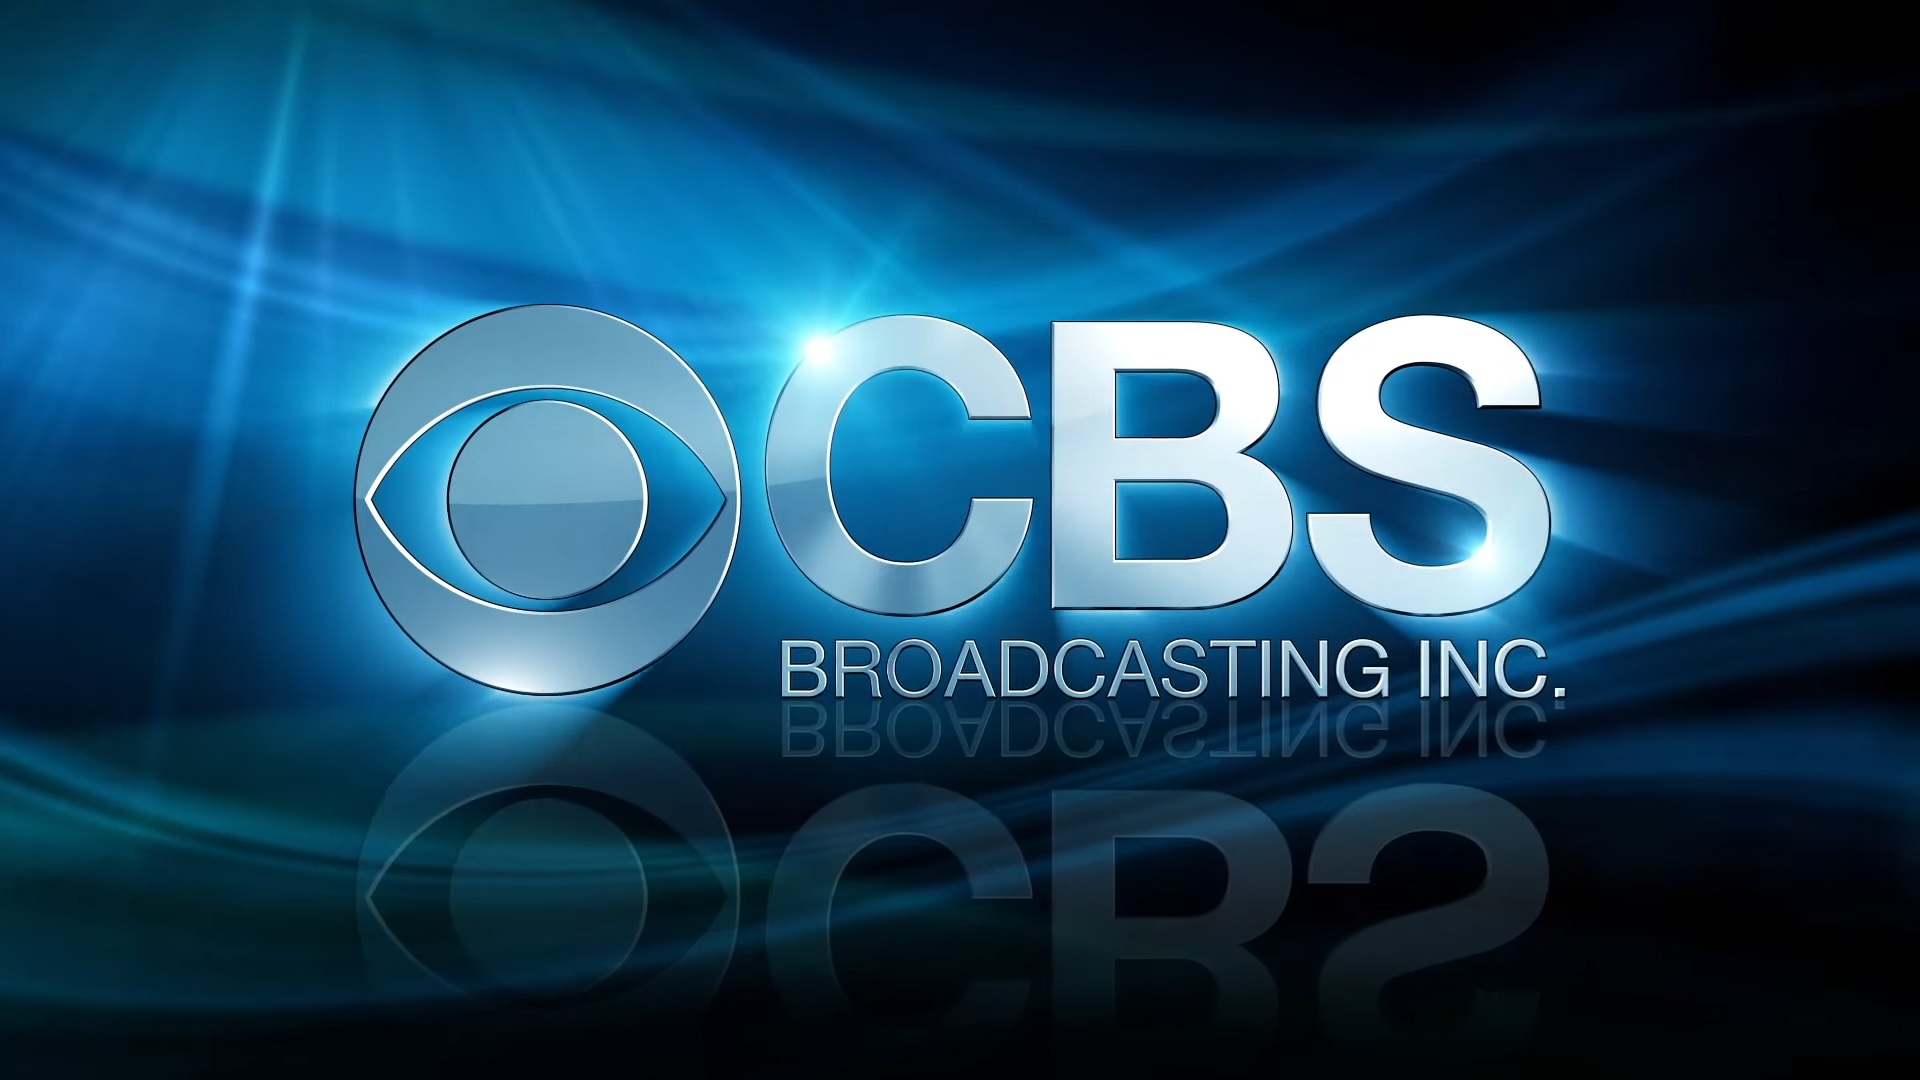 CBS Broadcasting Inc.